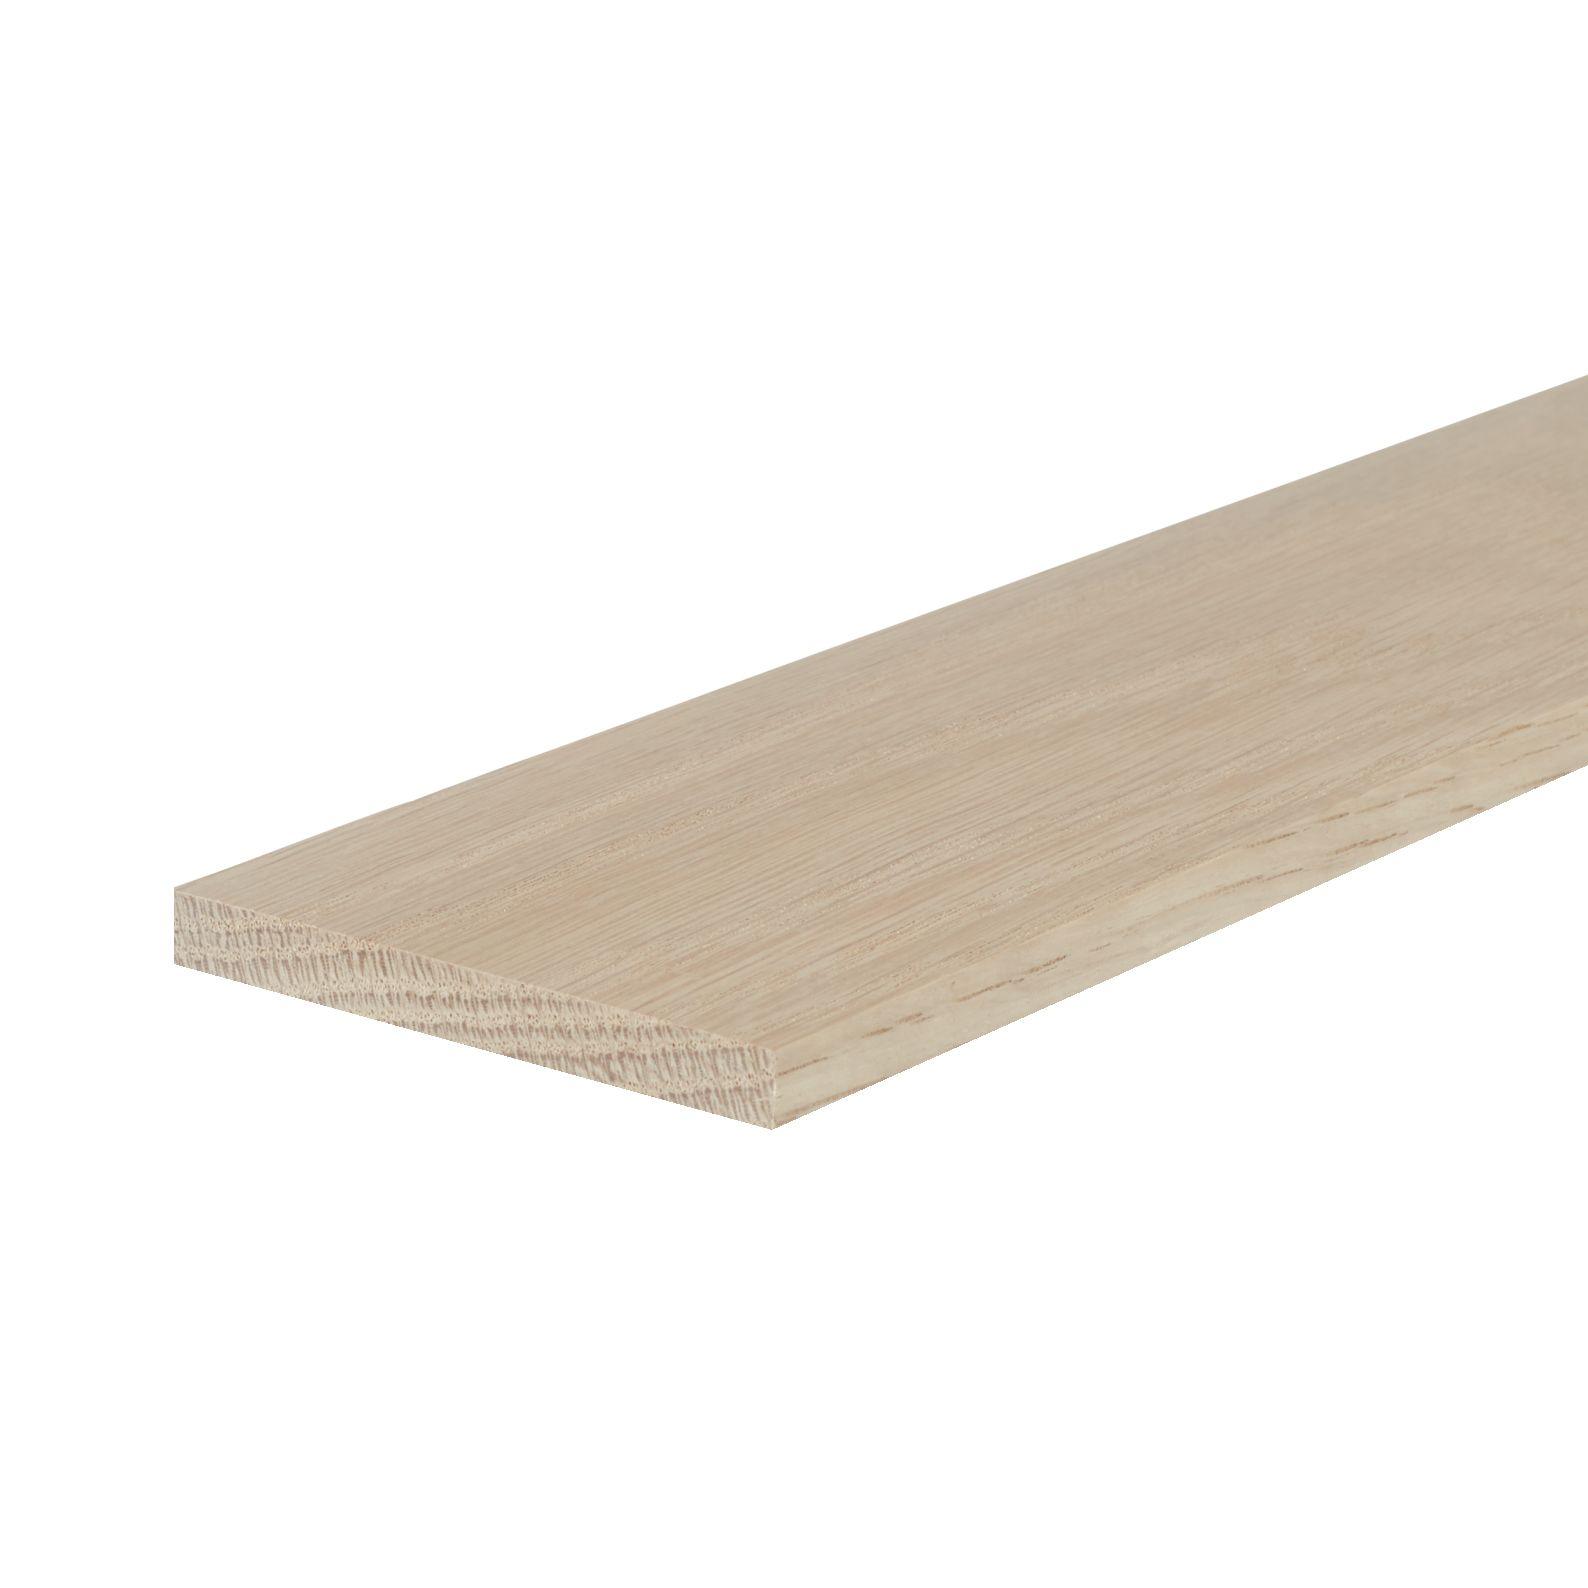 Solid White Oak Filet Strip 8mm X 41mm Fits 41mm Groove